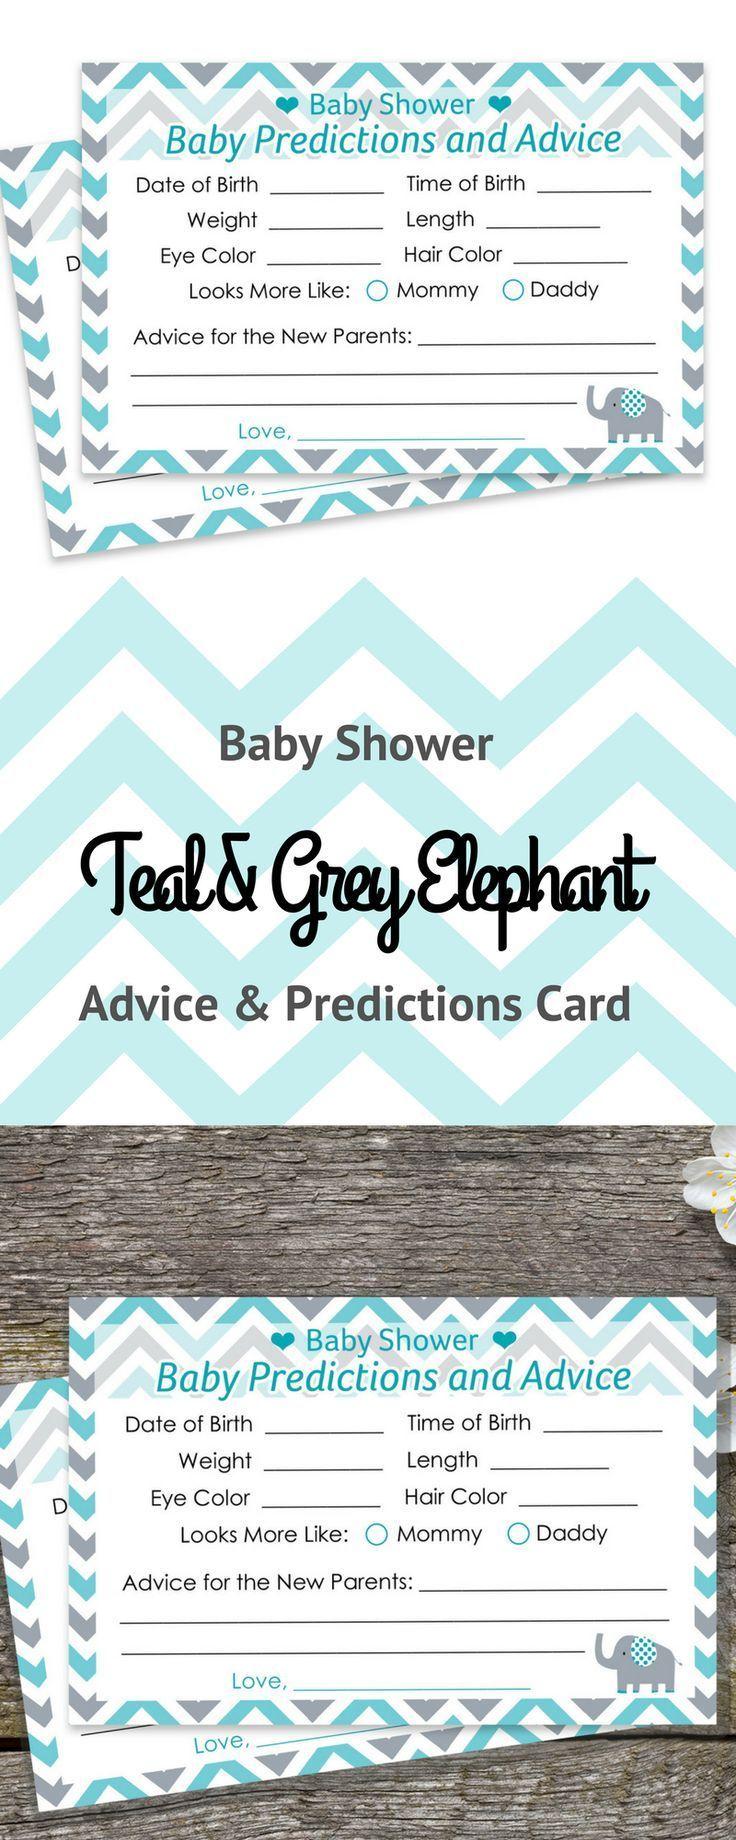 best kaysonus shower images on pinterest baby boy shower boy